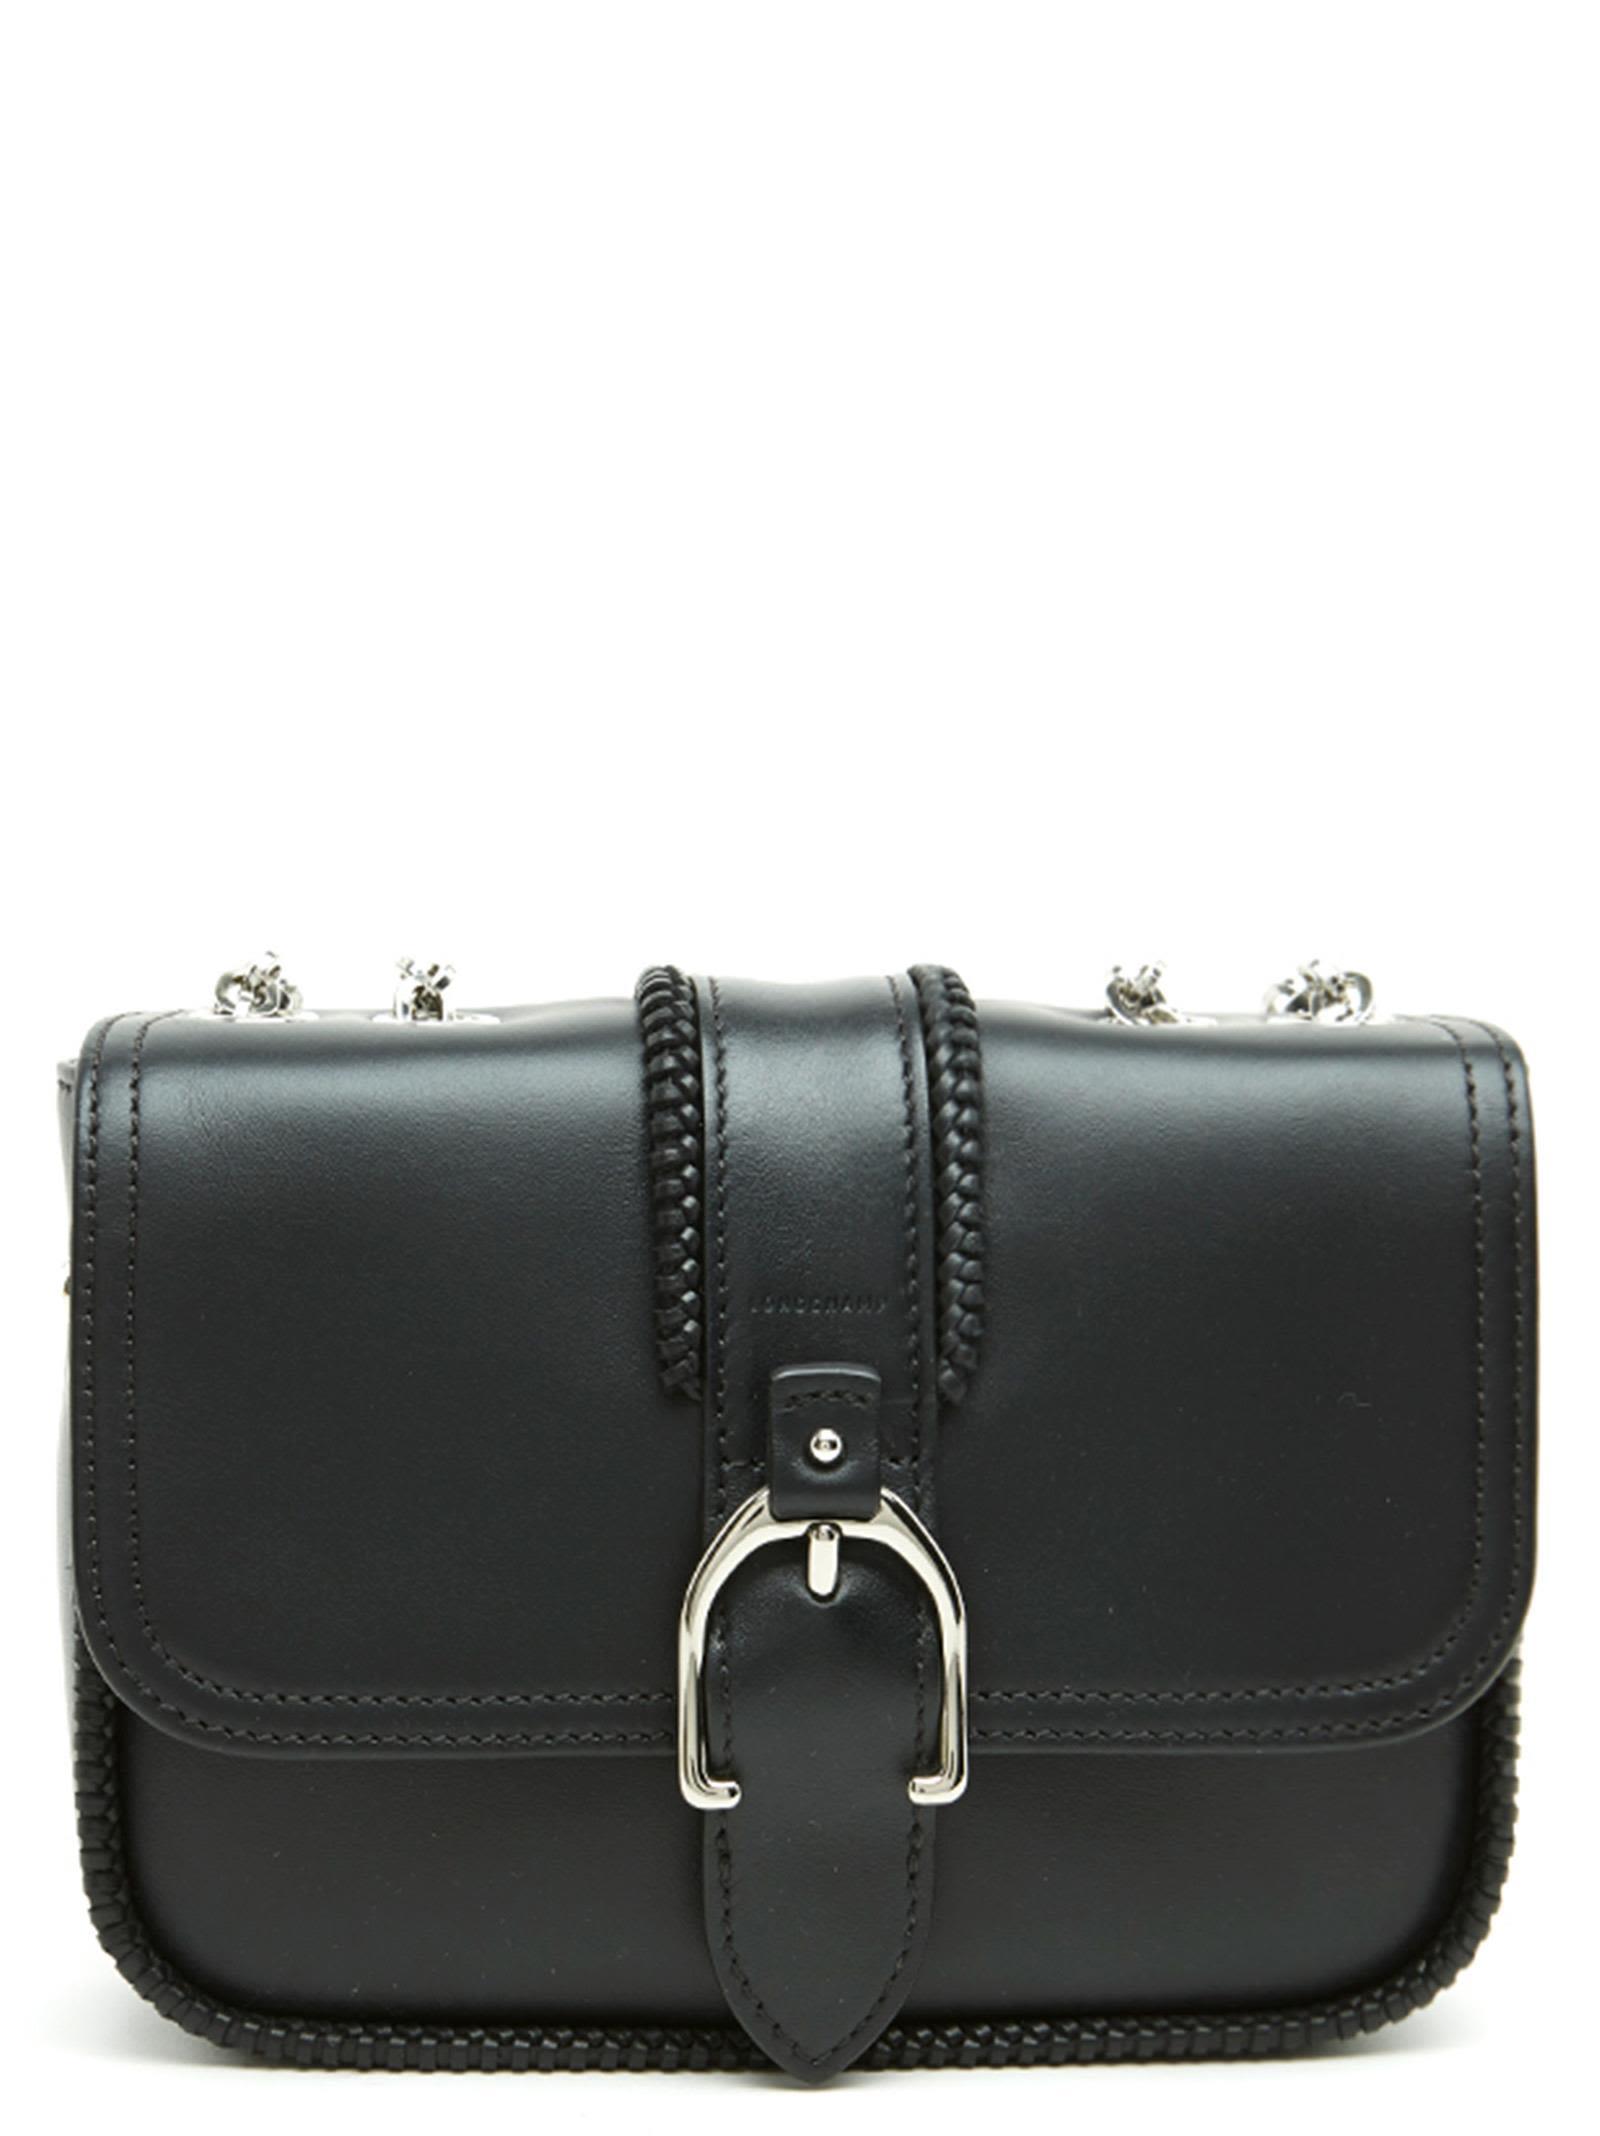 1642a0ab3fb9 Longchamp  Amazone  Bag In Black